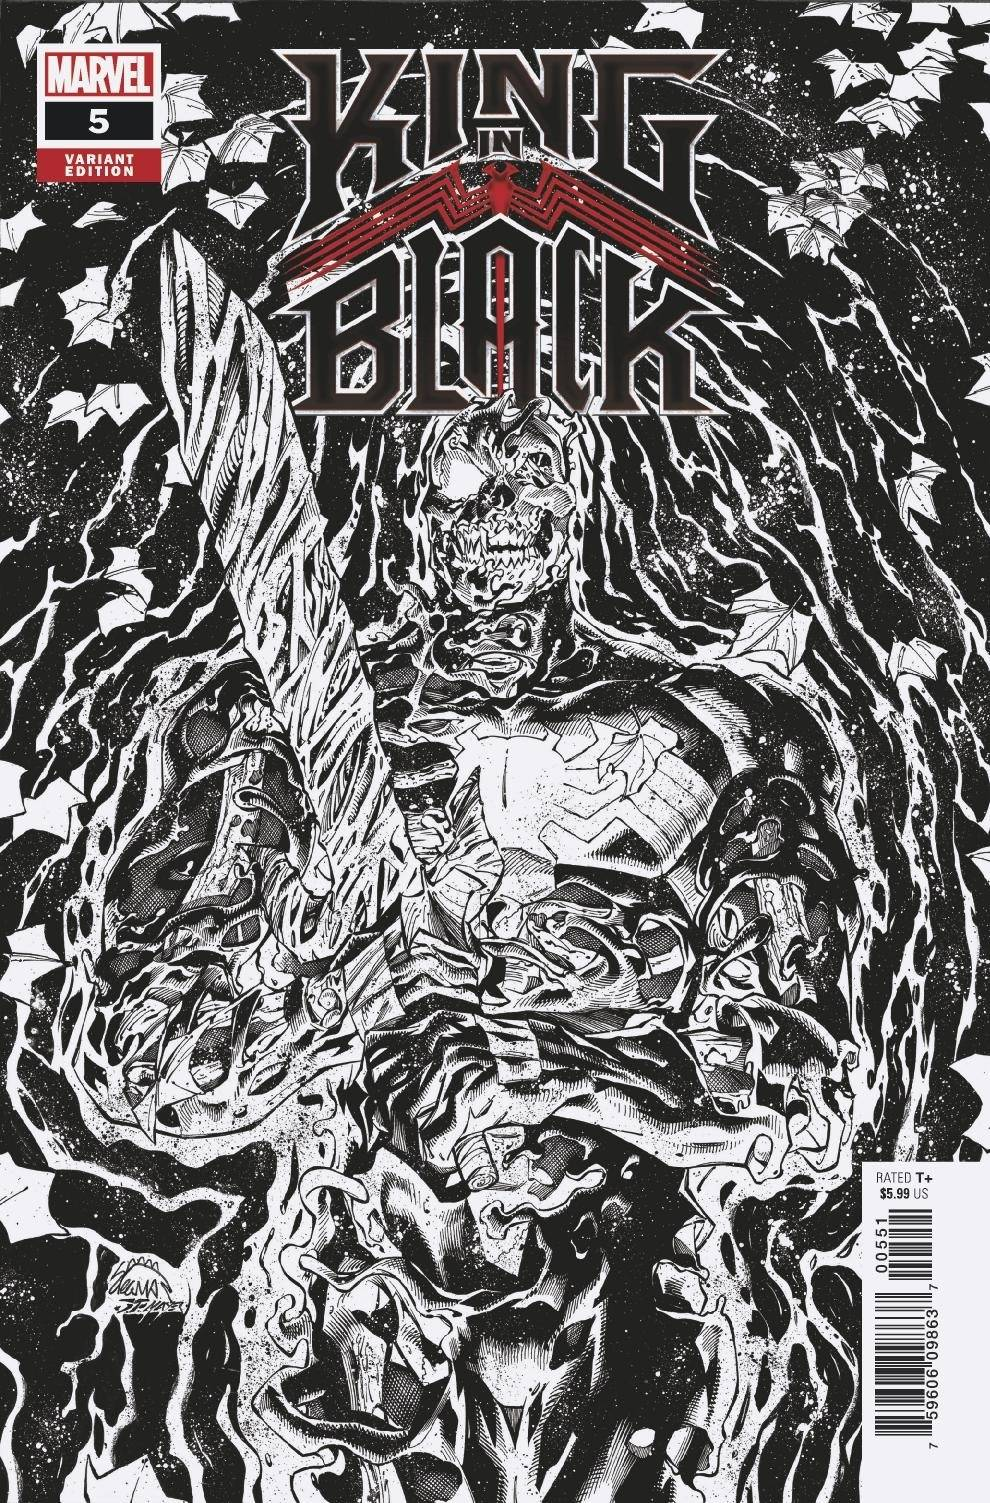 STL180522 ComicList: Marvel Comics New Releases for 04/07/2021